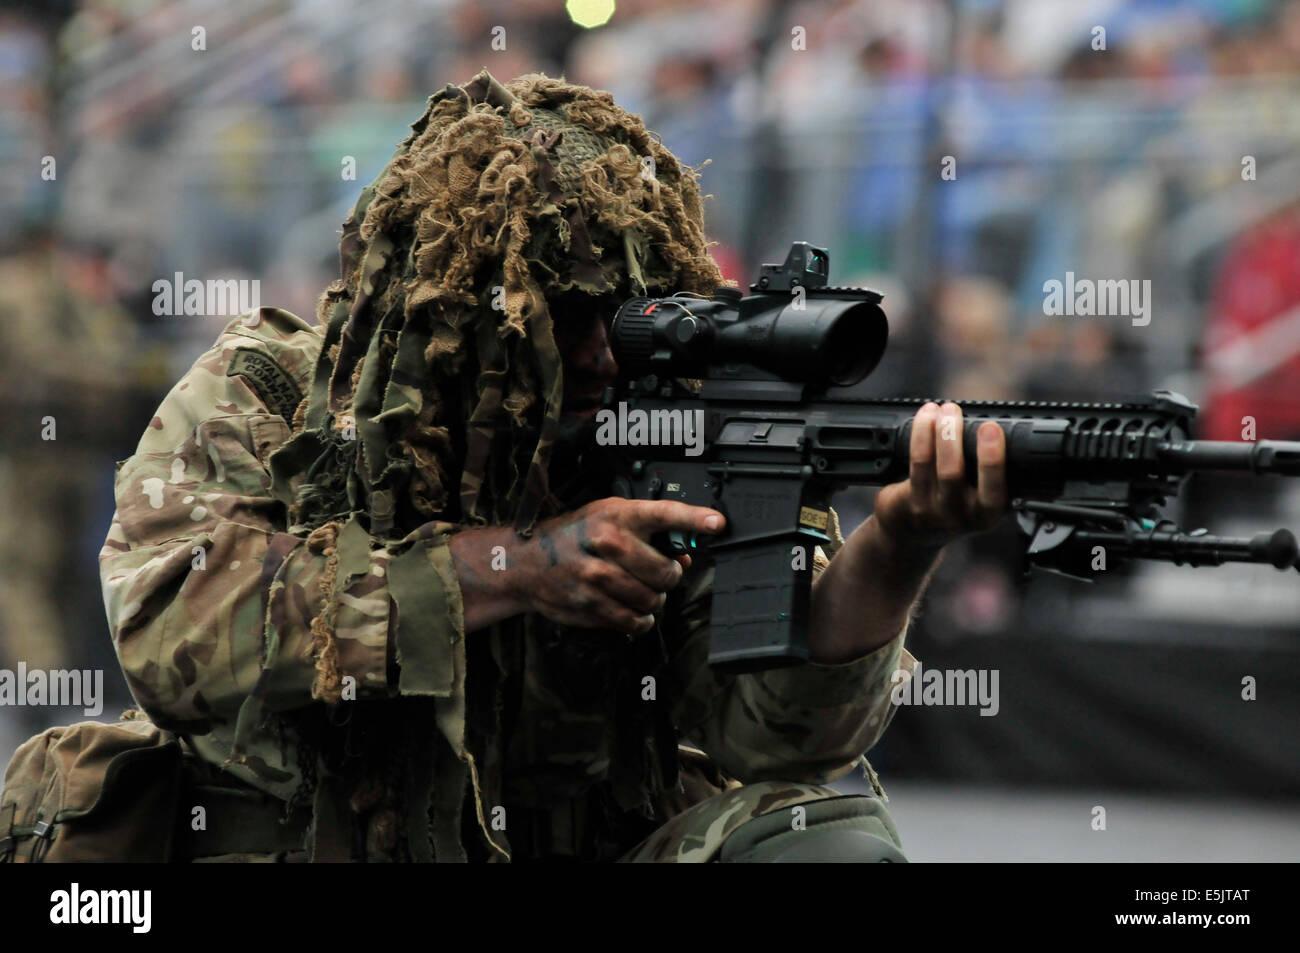 Edinburgh, Scotland, UK. 2nd August 2014. The Royal Edinburgh Military Tattoo takes place on the esplanade of the Stock Photo